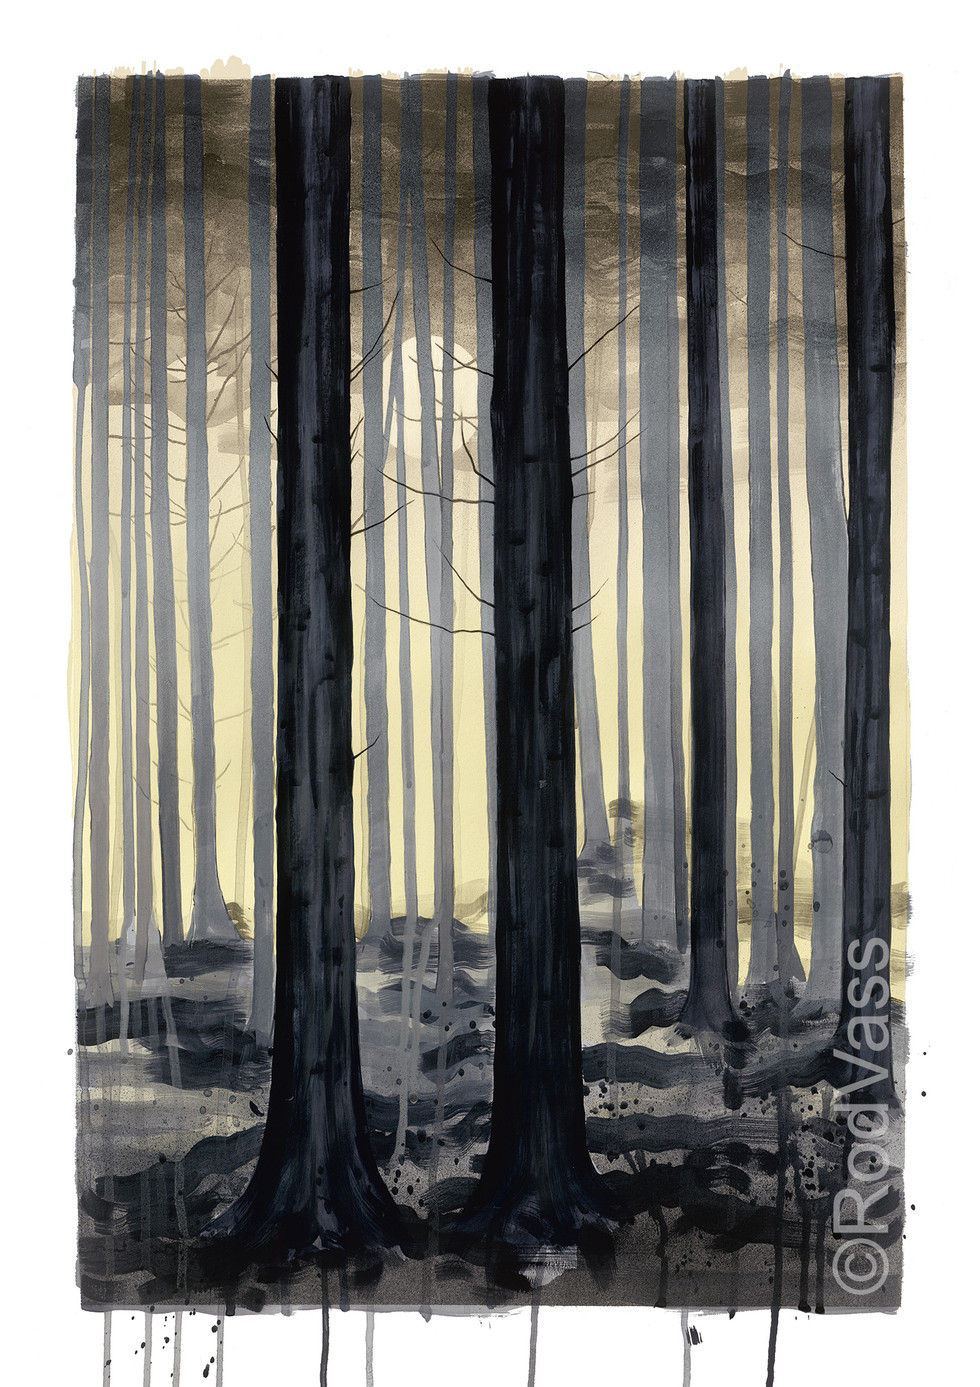 Grey Trees - right panel - By Rod Vass